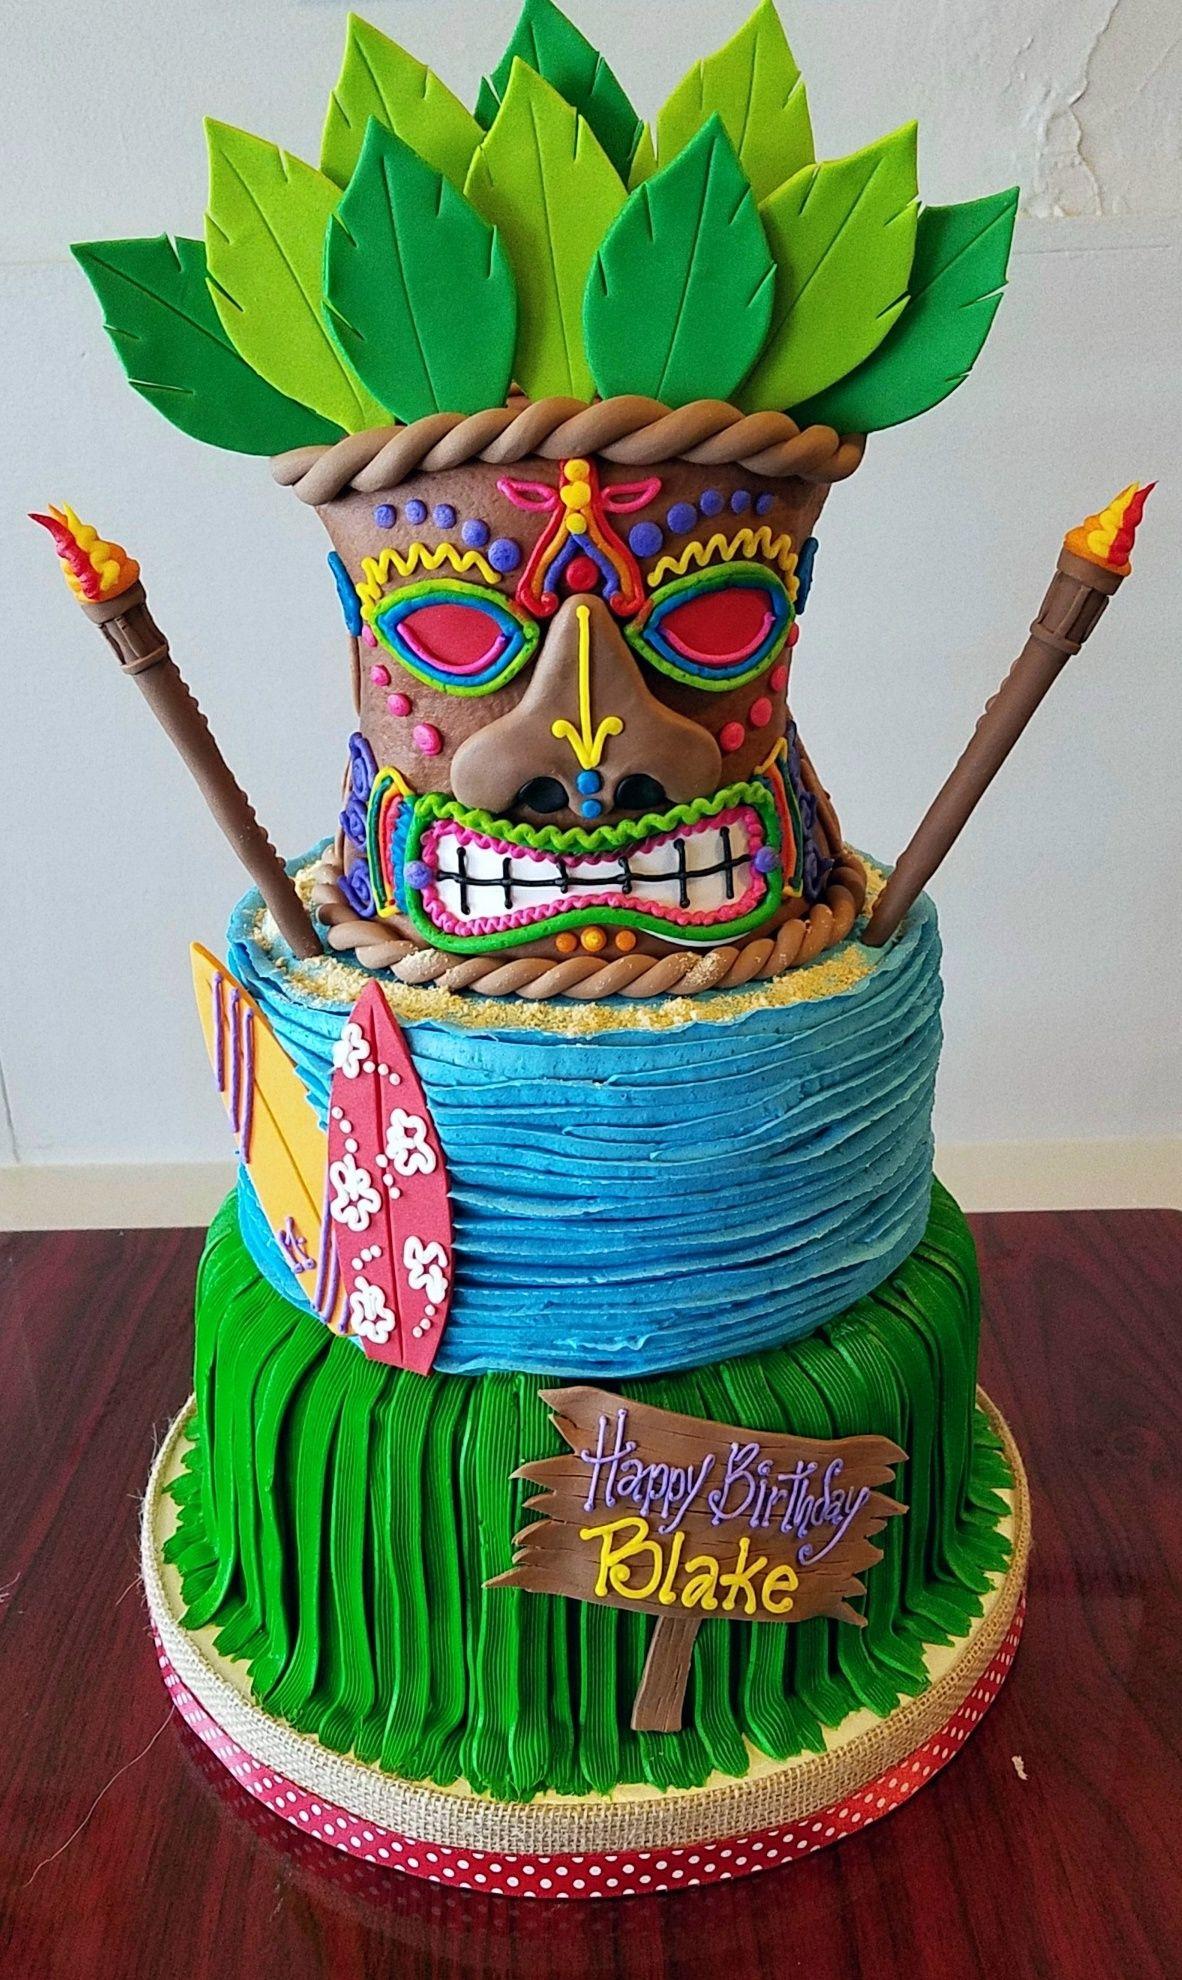 Pleasant Luau Tiki Birthday Cake Adrienne Co Bakery With Images Funny Birthday Cards Online Elaedamsfinfo